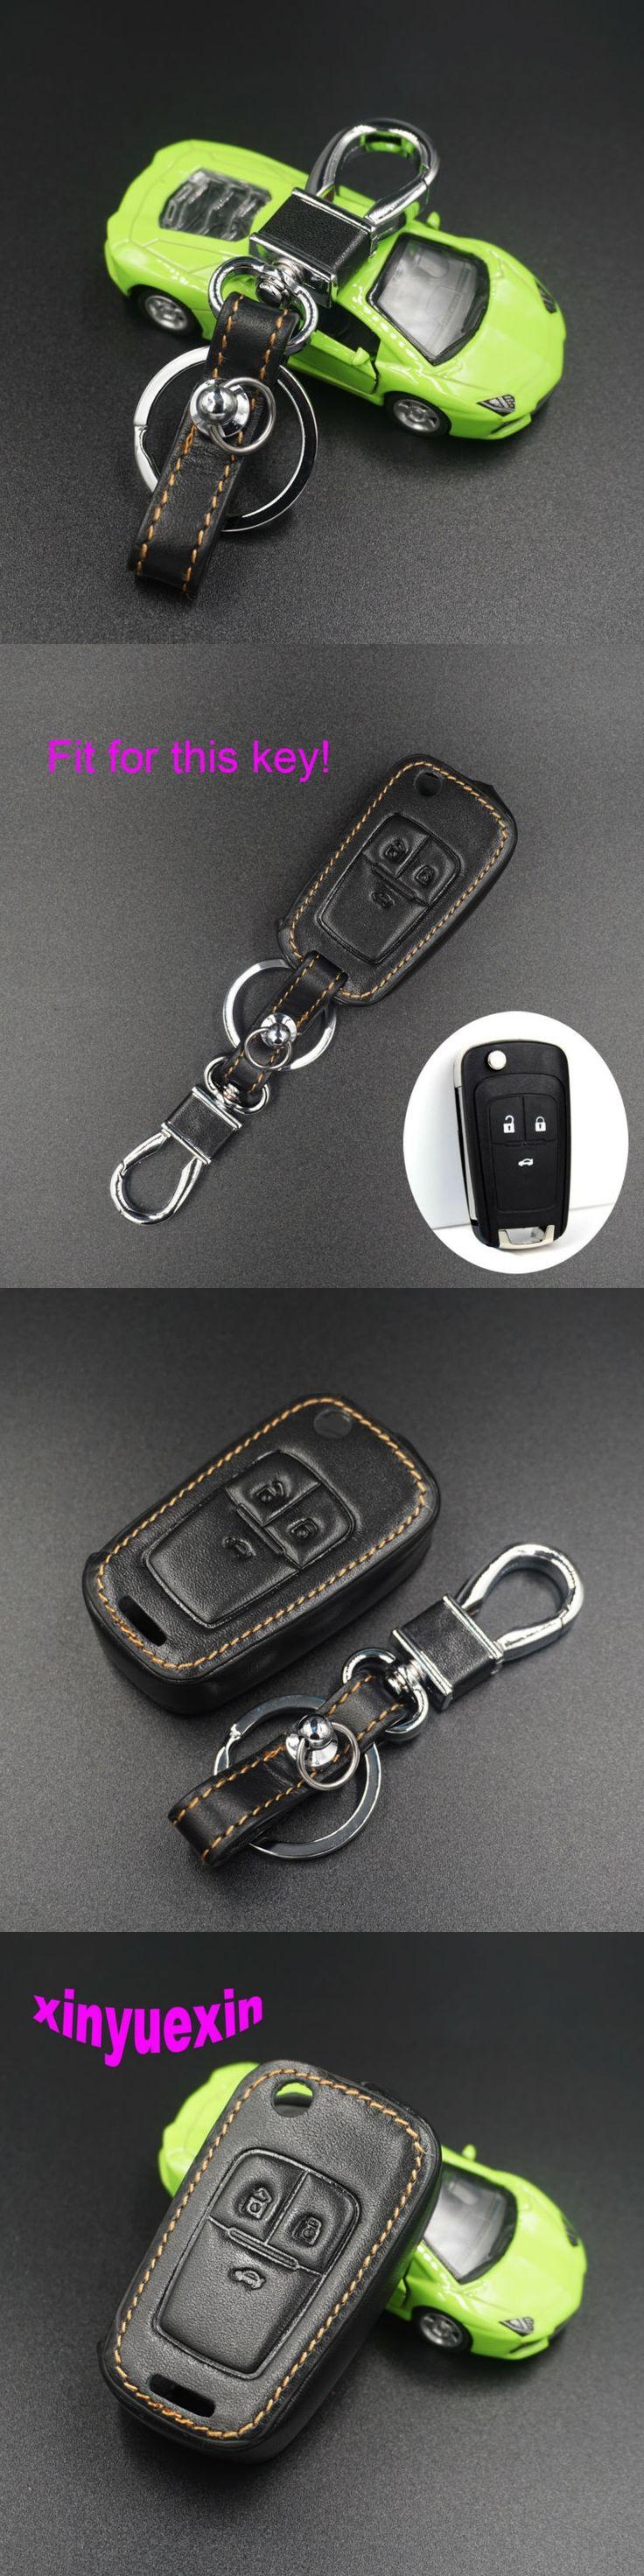 Xinyuexin Leather Car Key Cover Fob Case For Chevrolet Cruze 2013 Spark Onix Silverado Volt Camaro Aveo Sonic Remote Key Jacket